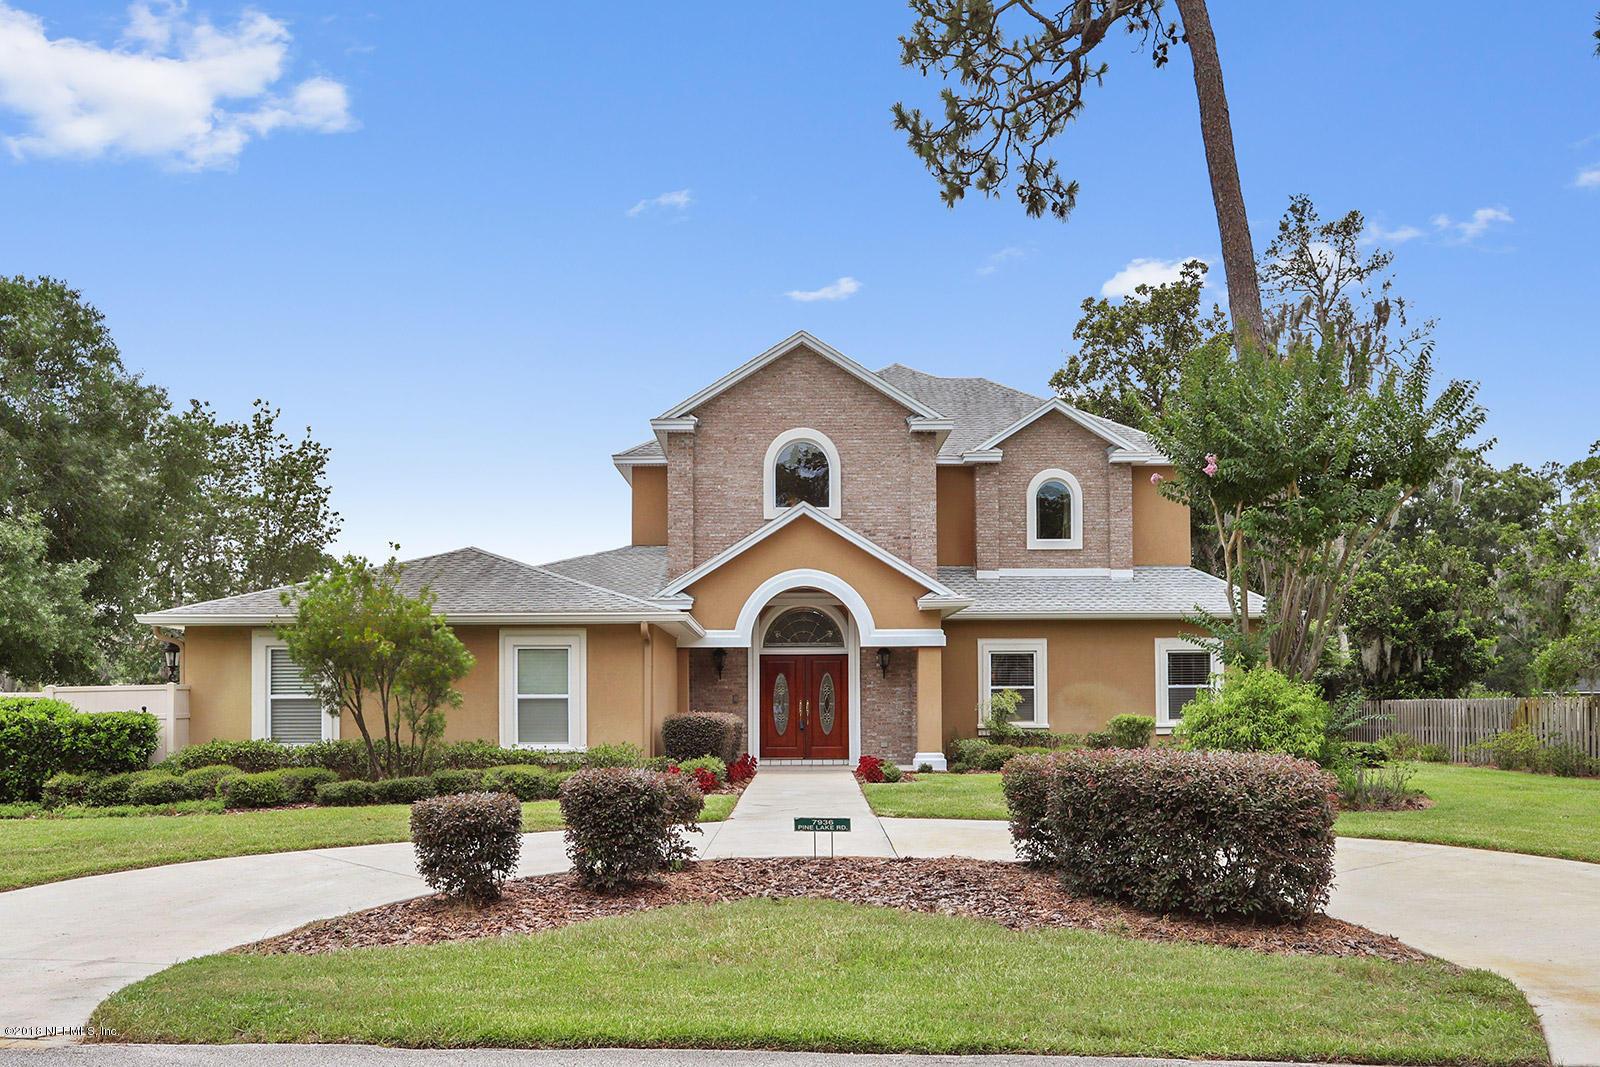 7936 PINE LAKE, JACKSONVILLE, FLORIDA 32256, 4 Bedrooms Bedrooms, ,4 BathroomsBathrooms,Multi family,For sale,PINE LAKE,970177